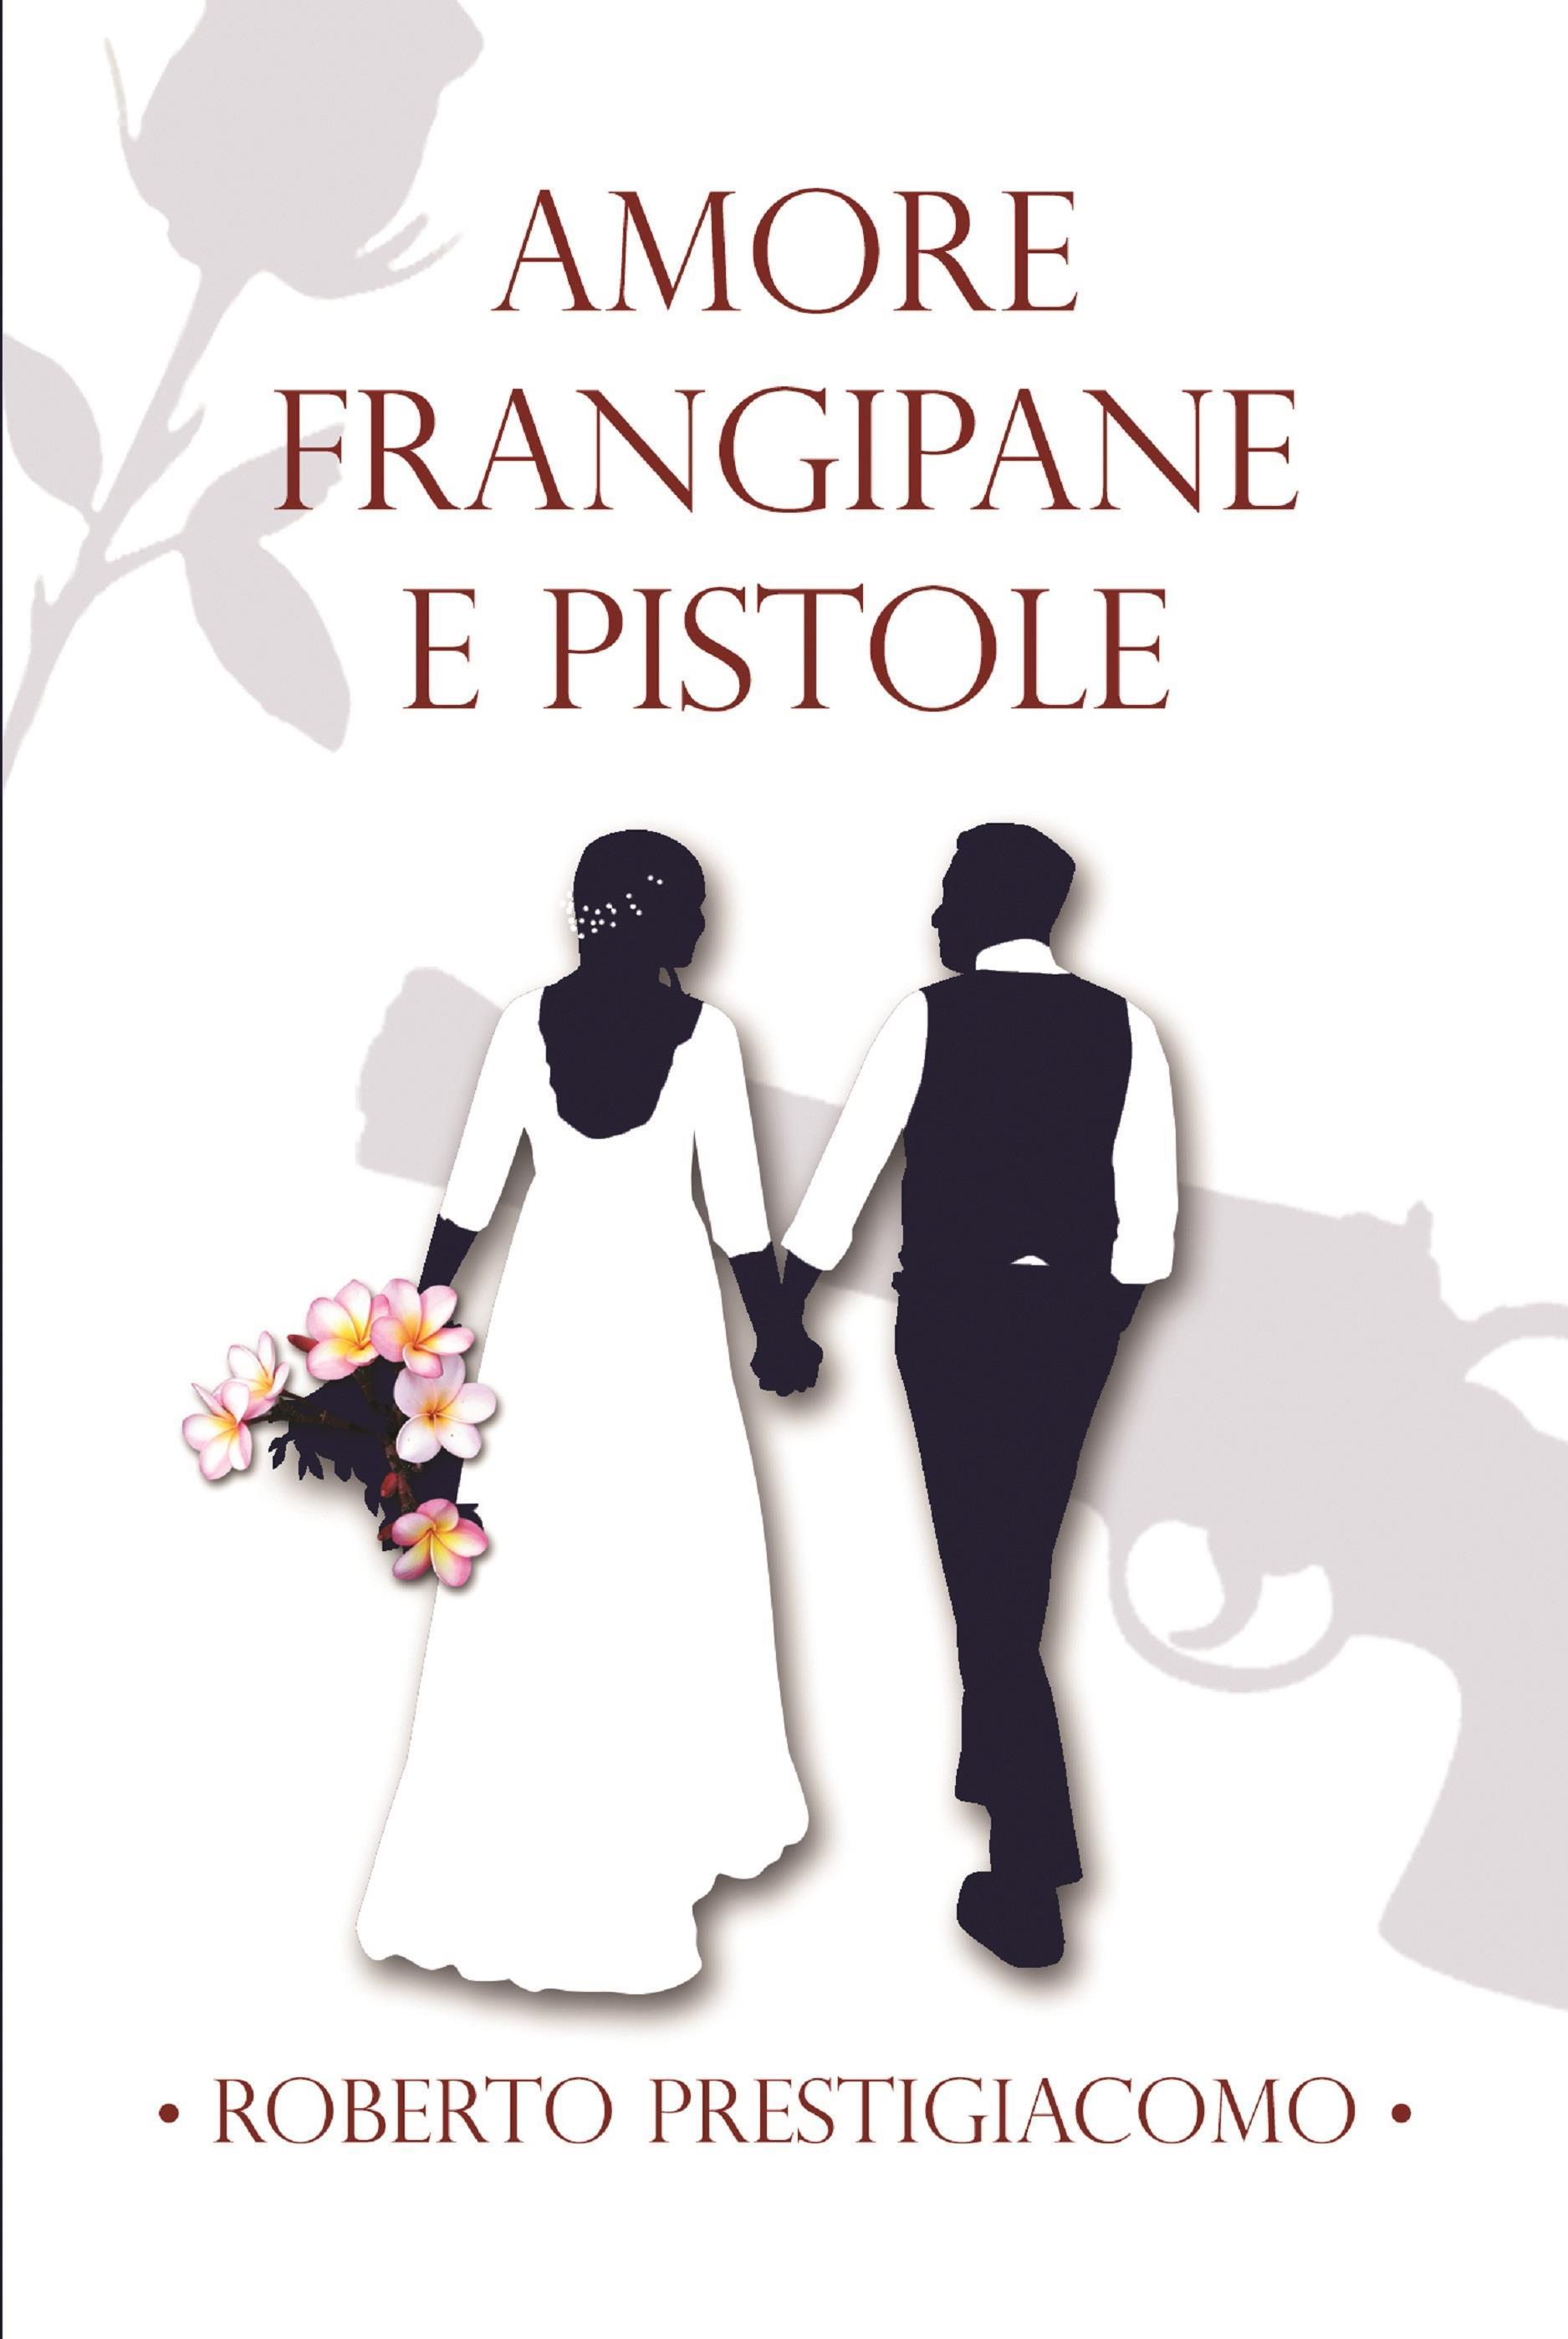 Amore Frangipane e Pistole